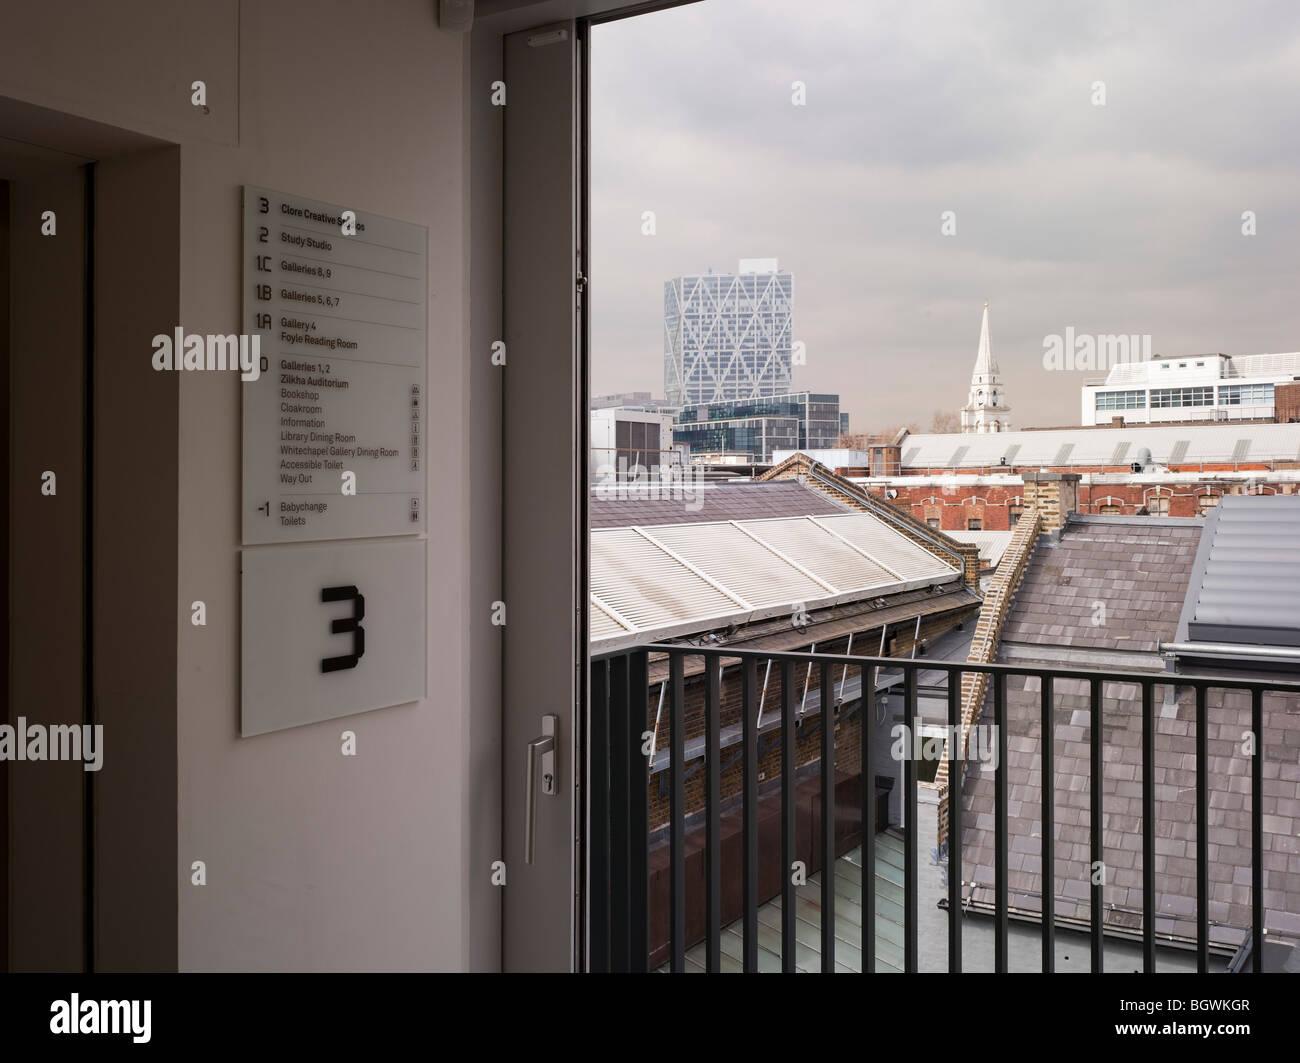 WHITECHAPEL ART GALLERY, LONDON, UNITED KINGDOM, WITHERFORD WATSON MANN / ROBBRECHT & DAEM Stock Photo